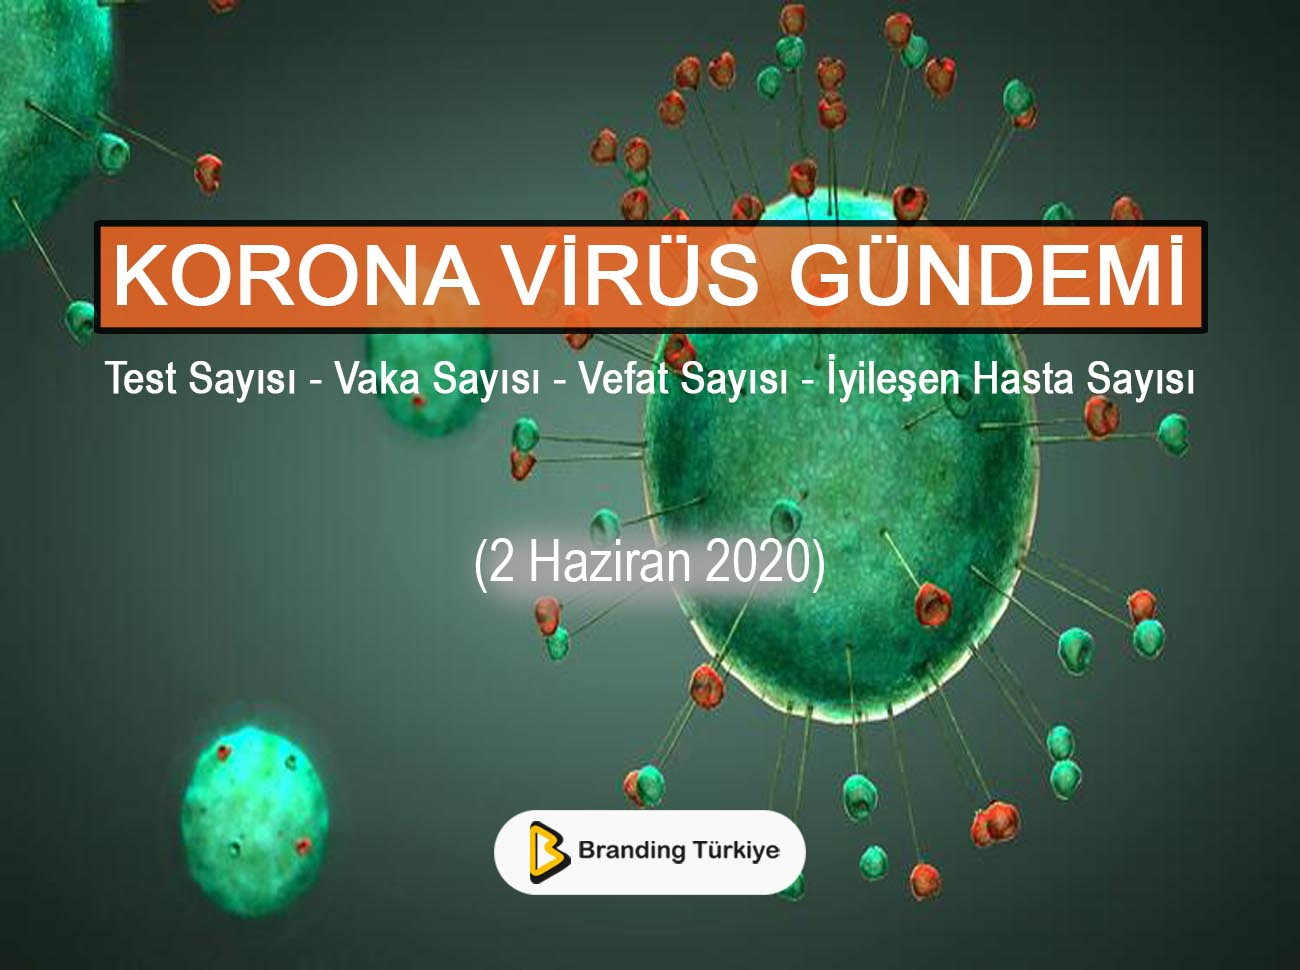 Korona Virüs Gündemi (2 Haziran 2020)